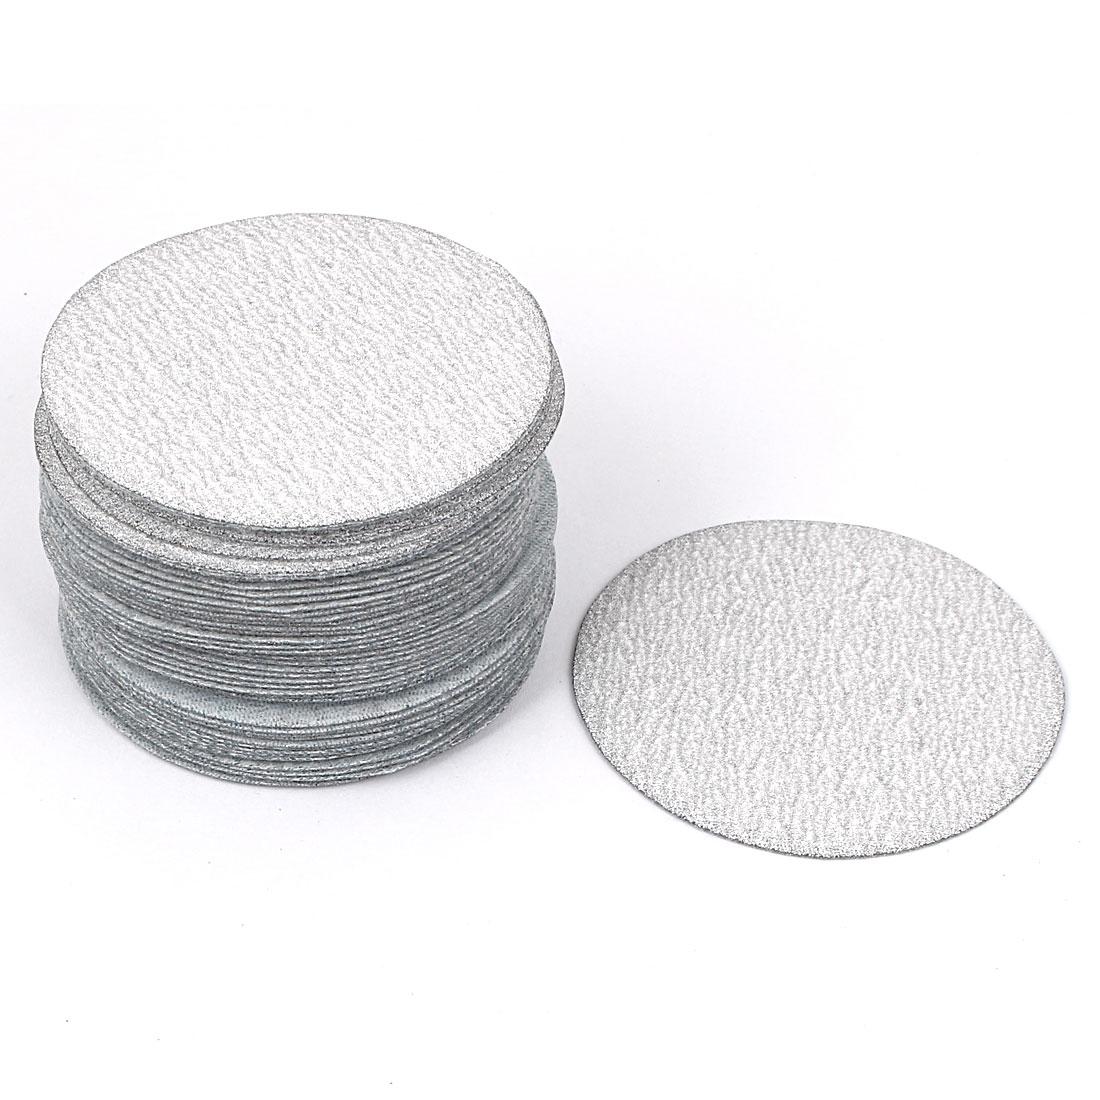 "3"" Dia Polishing Round Dry Abrasive Sanding Sandpaper Sheet Disc 240 Grit 50pcs"